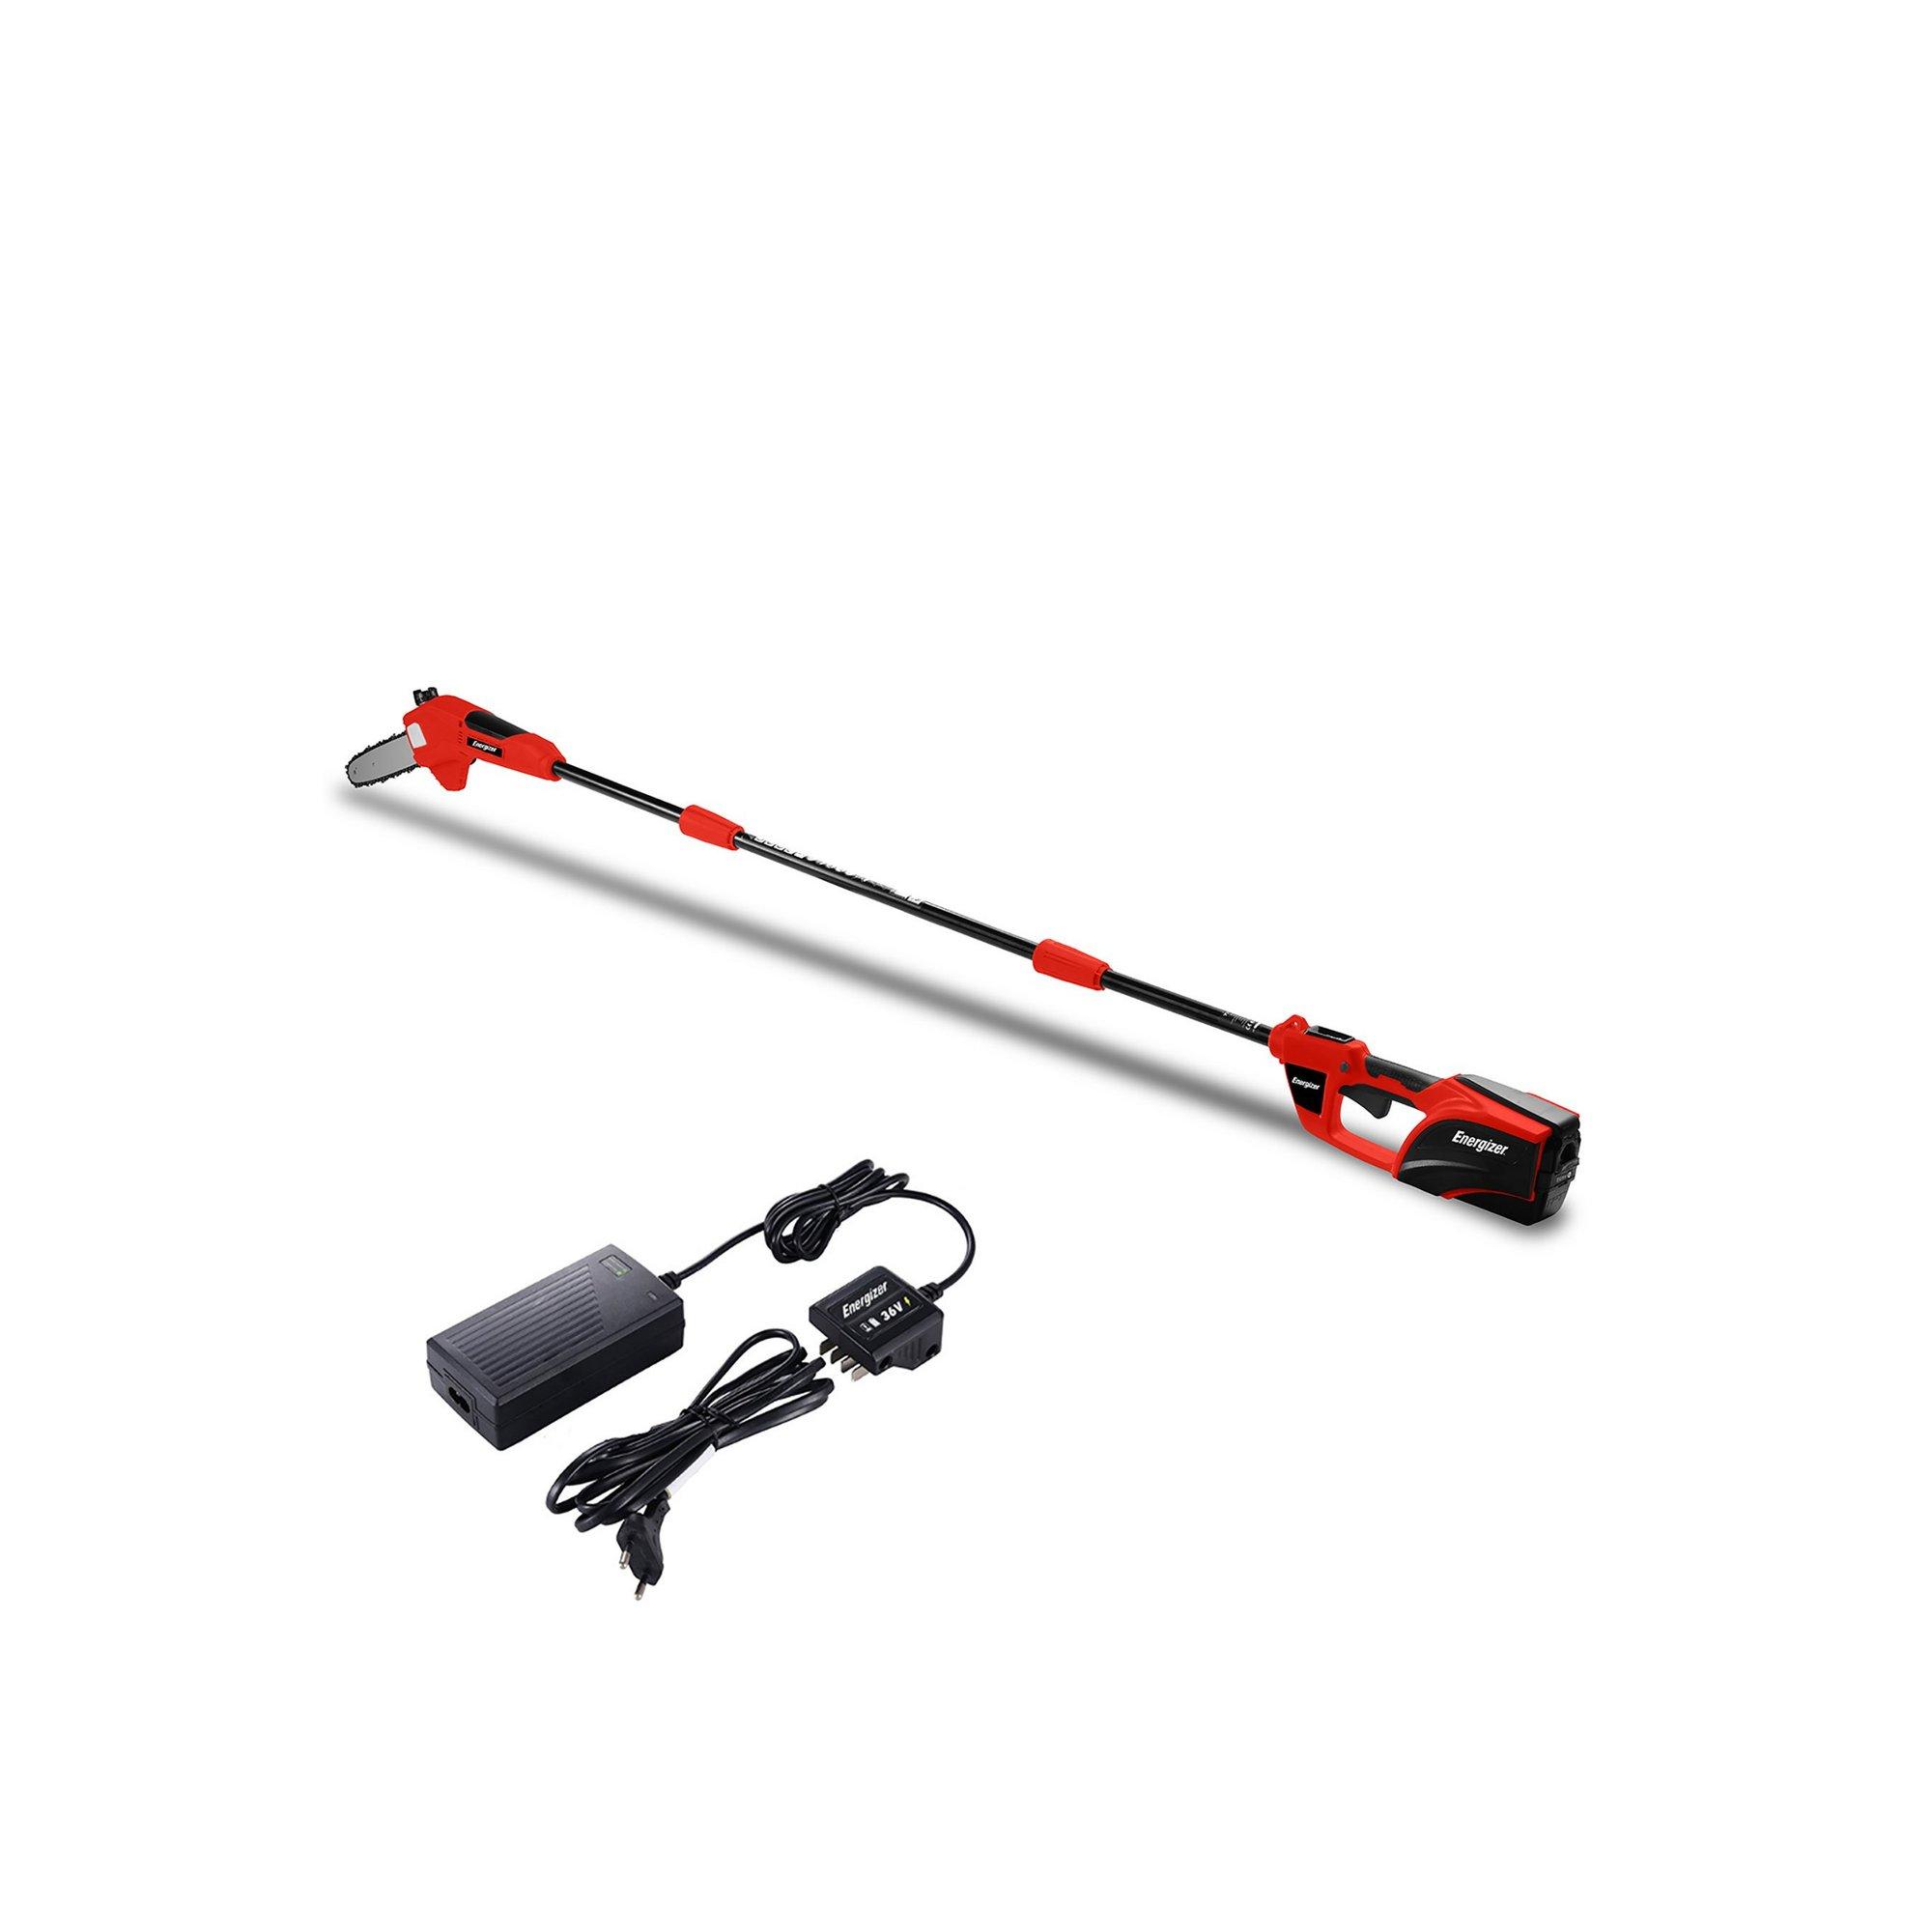 Image of Energizer Cordless Pole Pruner